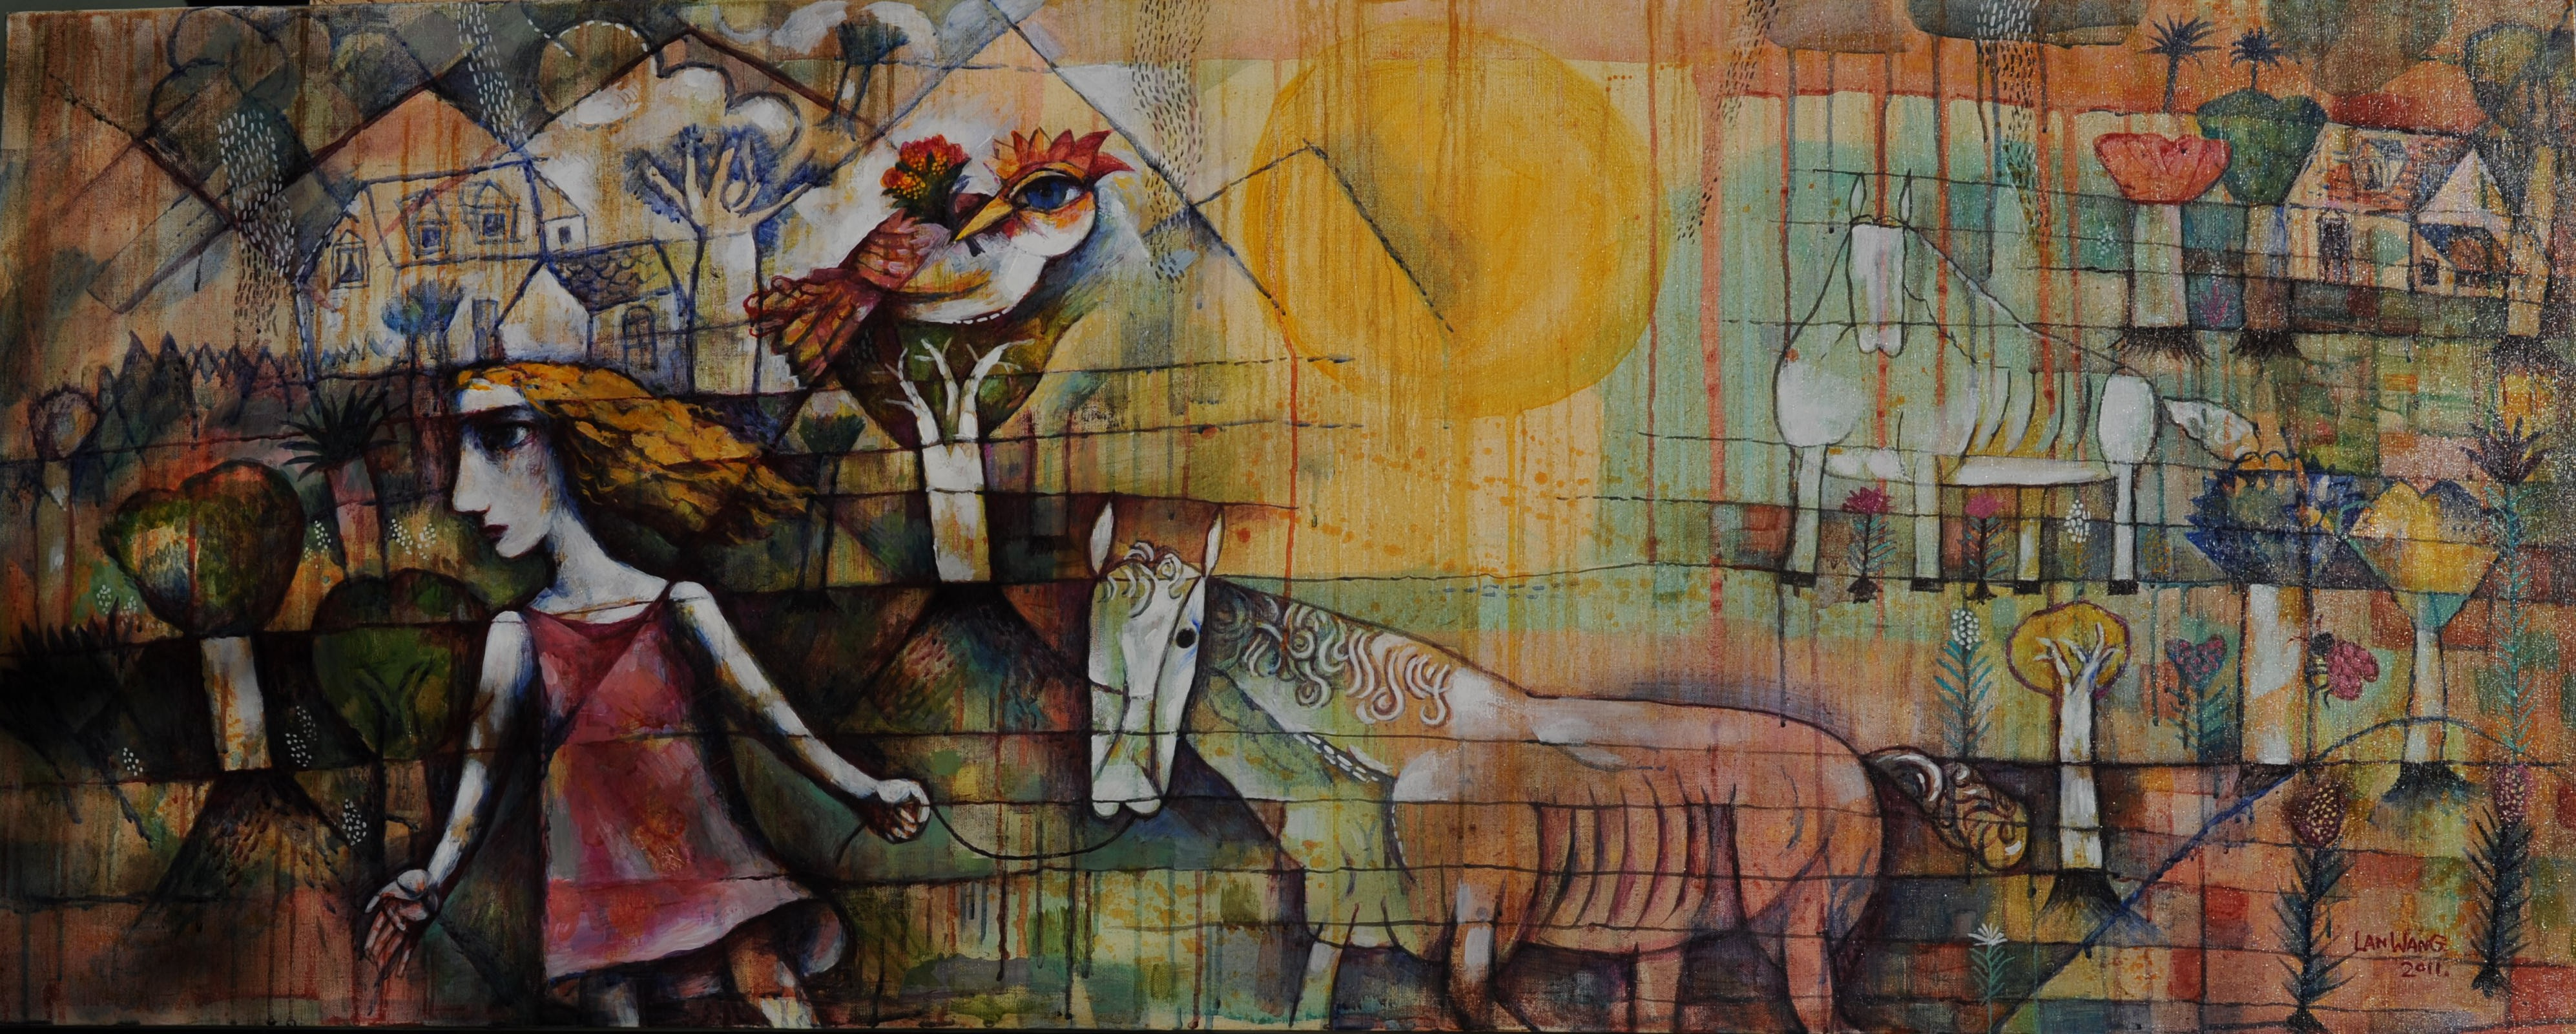 03-home-no3-2011-61-x-152-cm-canvas-3300